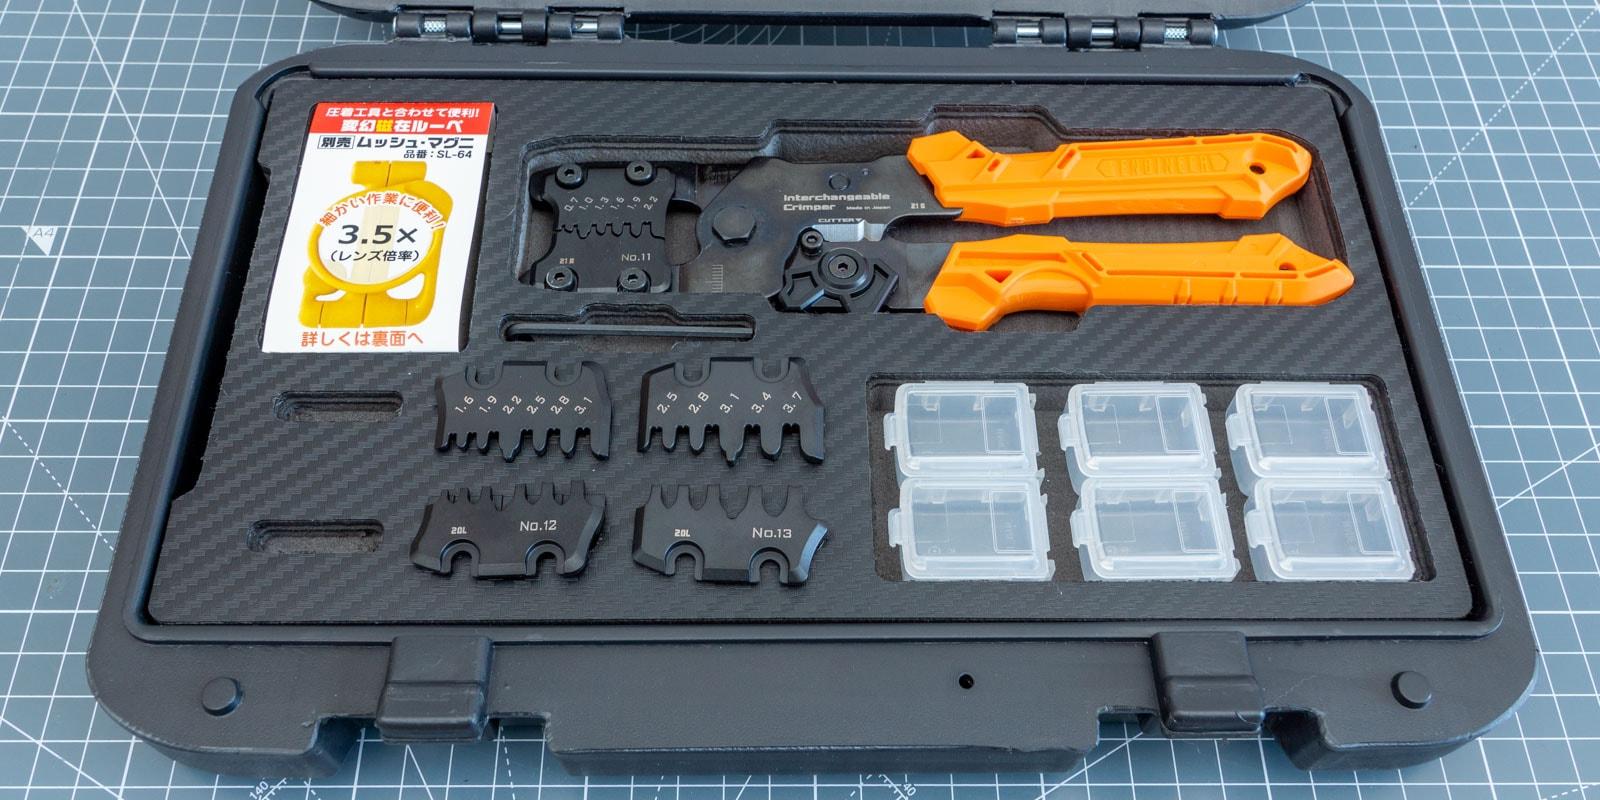 Engineer PAD-02 Crimping Tool Kit Review